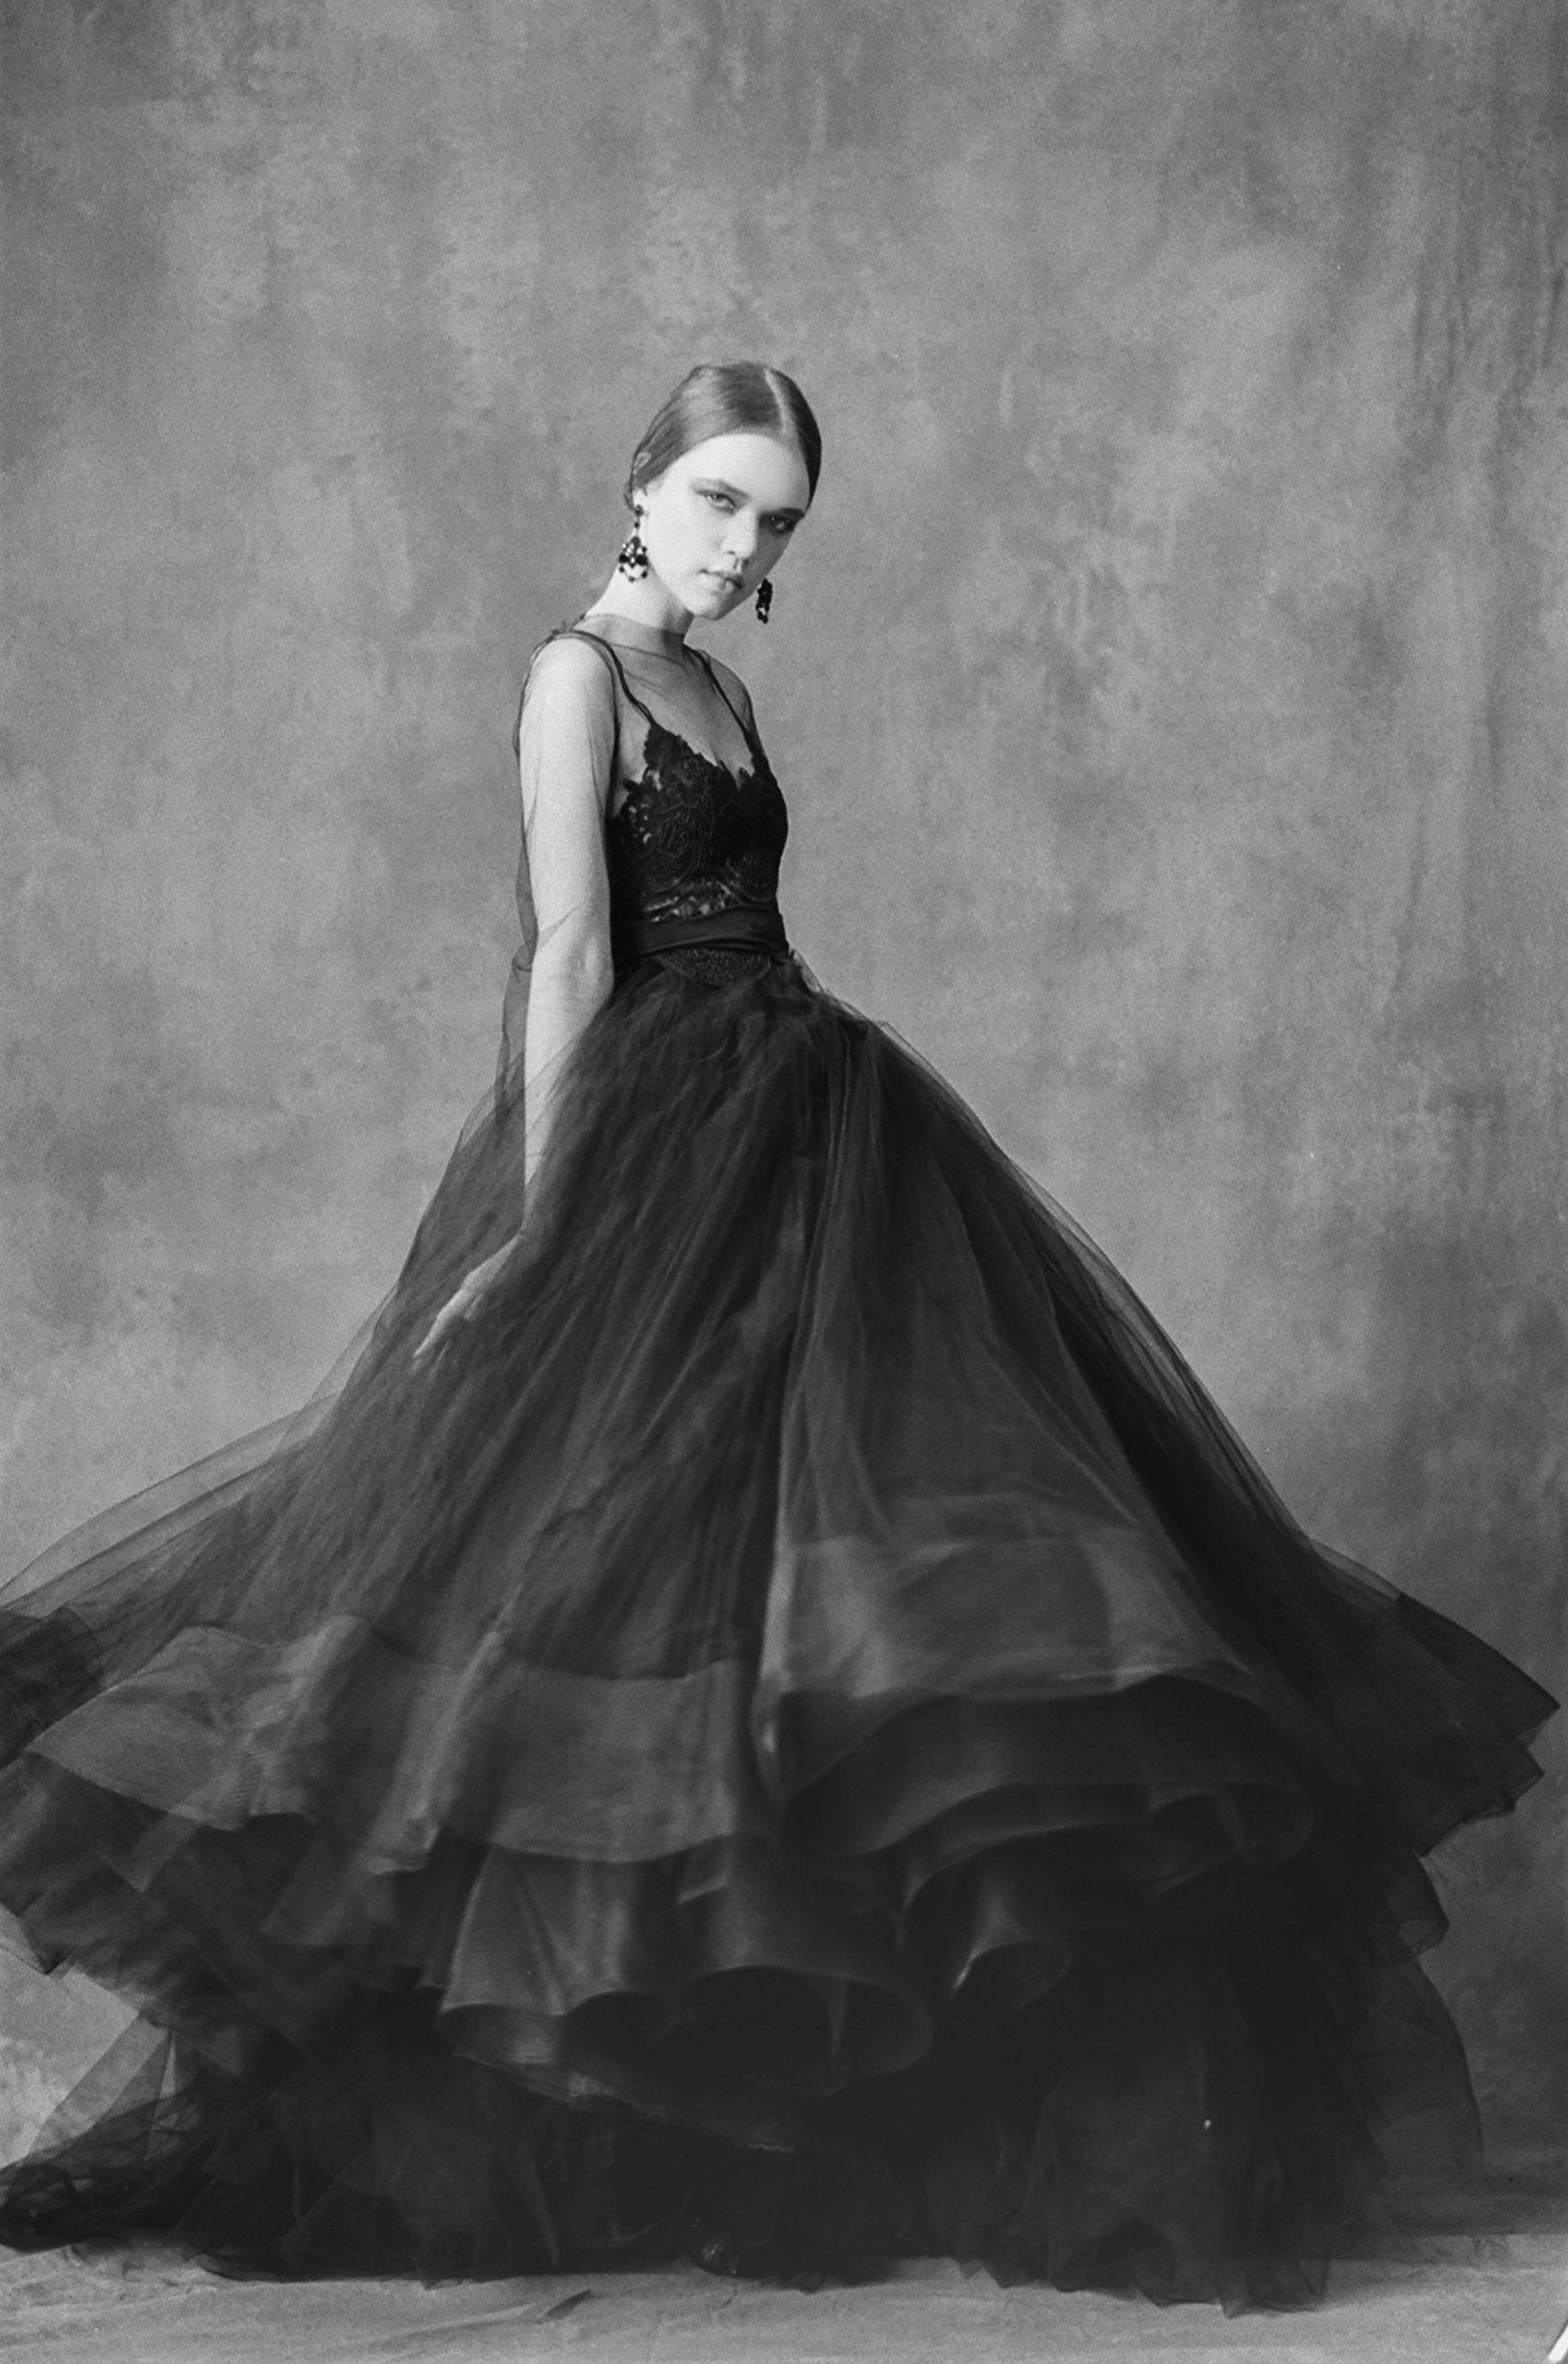 Bridal Full Length Black Tulle Bell Ball Gown Skirt by Corvus + Crux